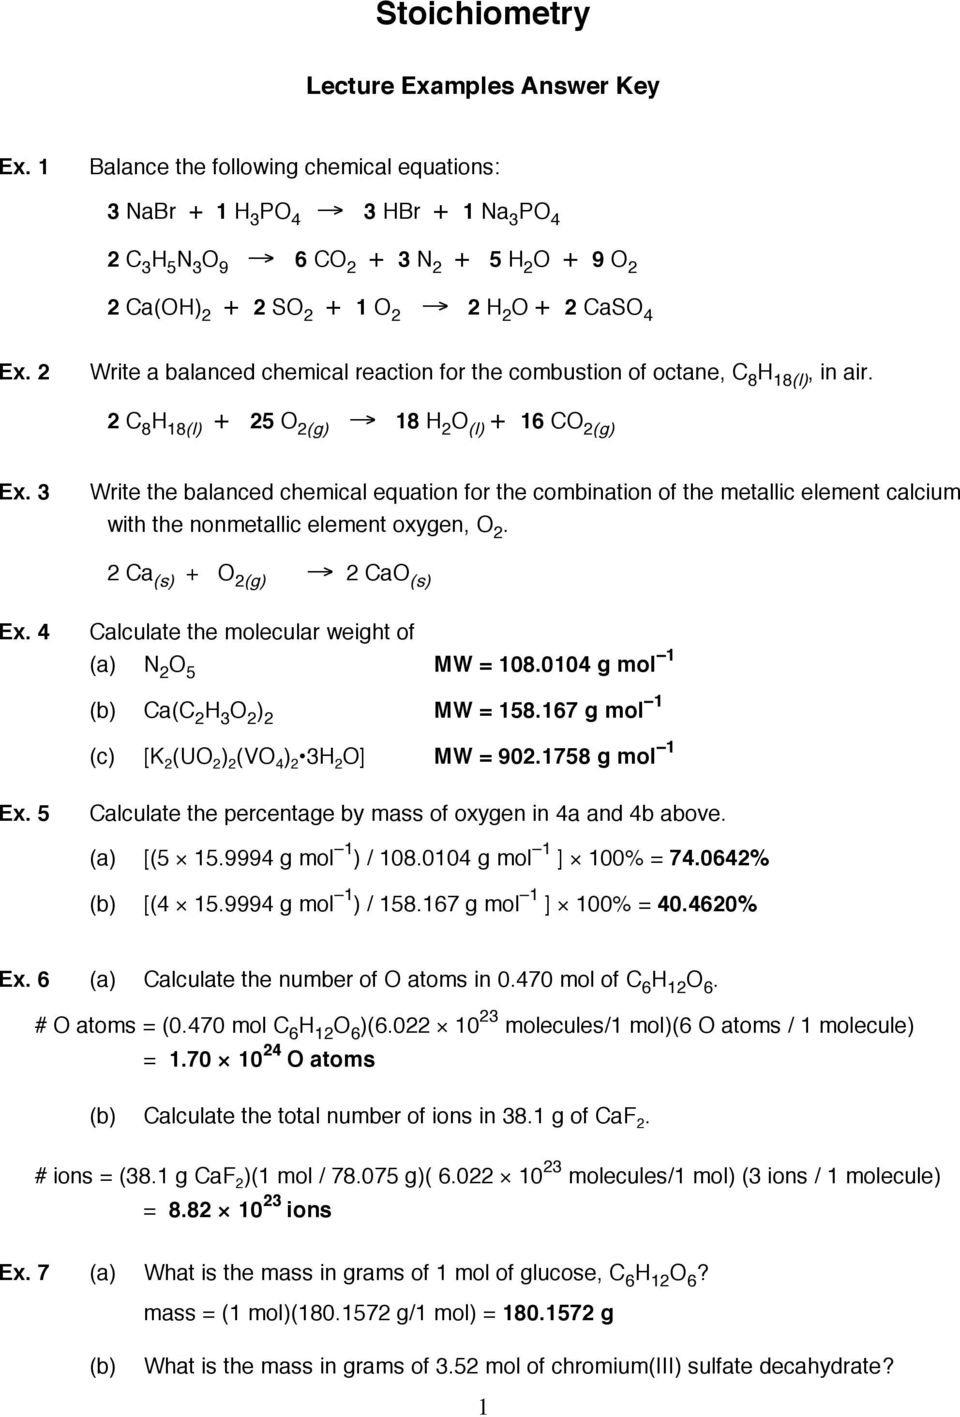 Stoichiometry Lecture Answer Key Pdf — db-excel.com